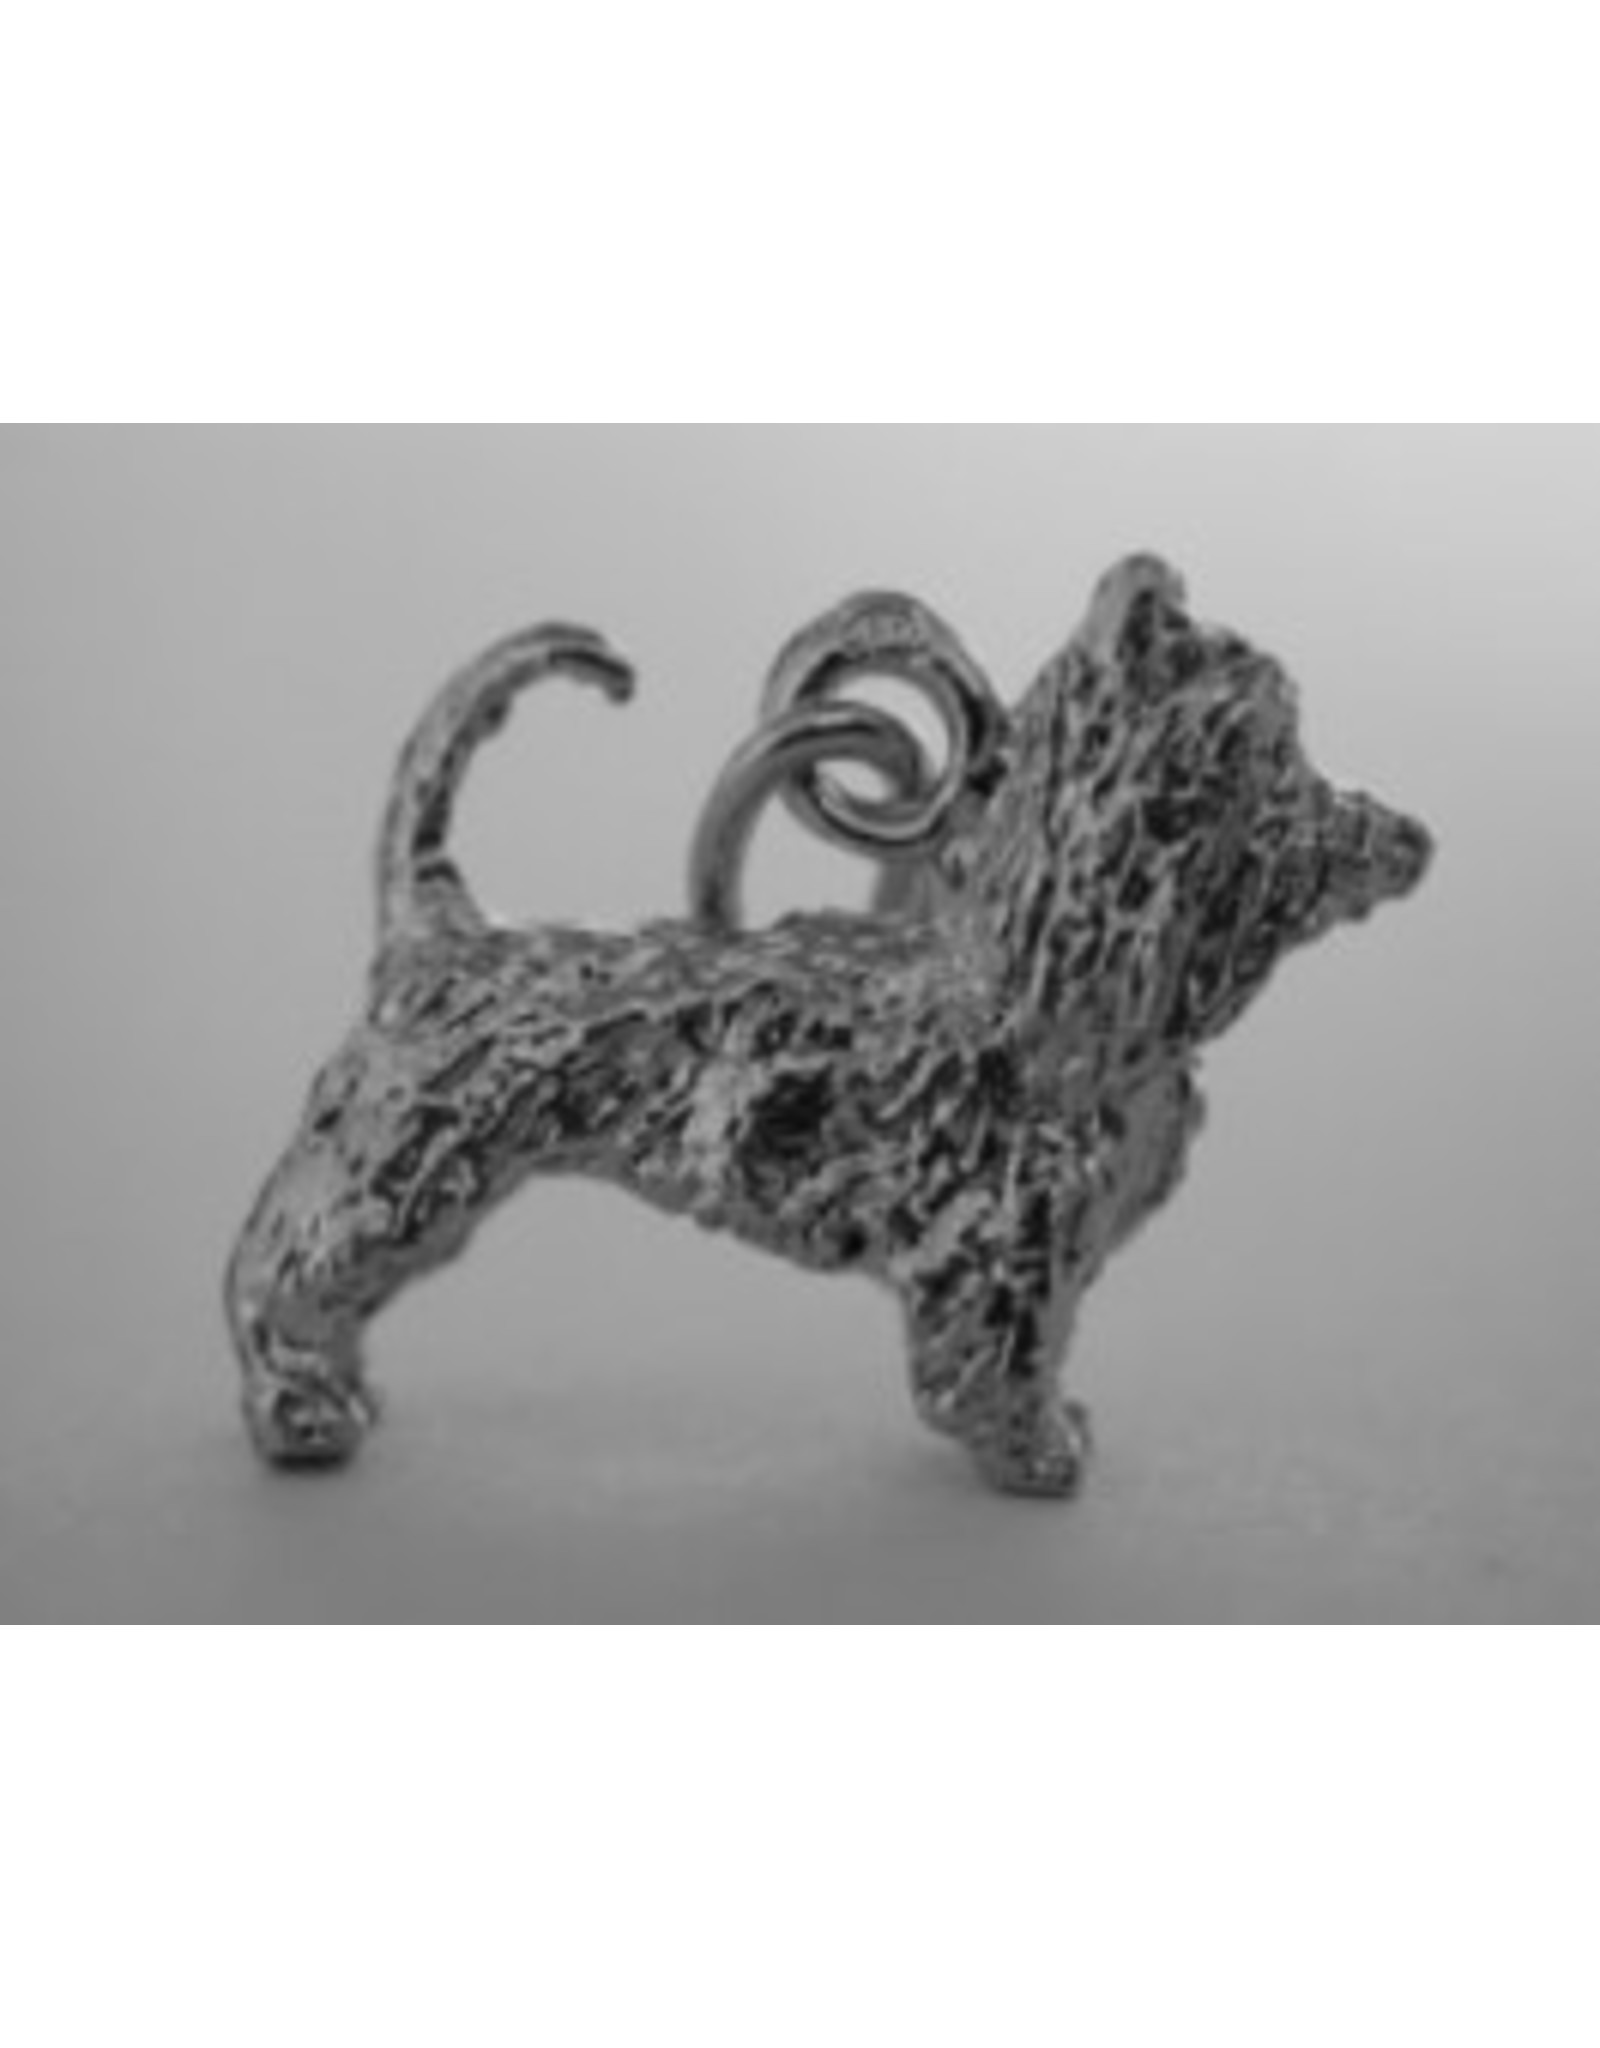 Handmade by Hanneke Weigel Zilveren Yorkshire terrier huismodel